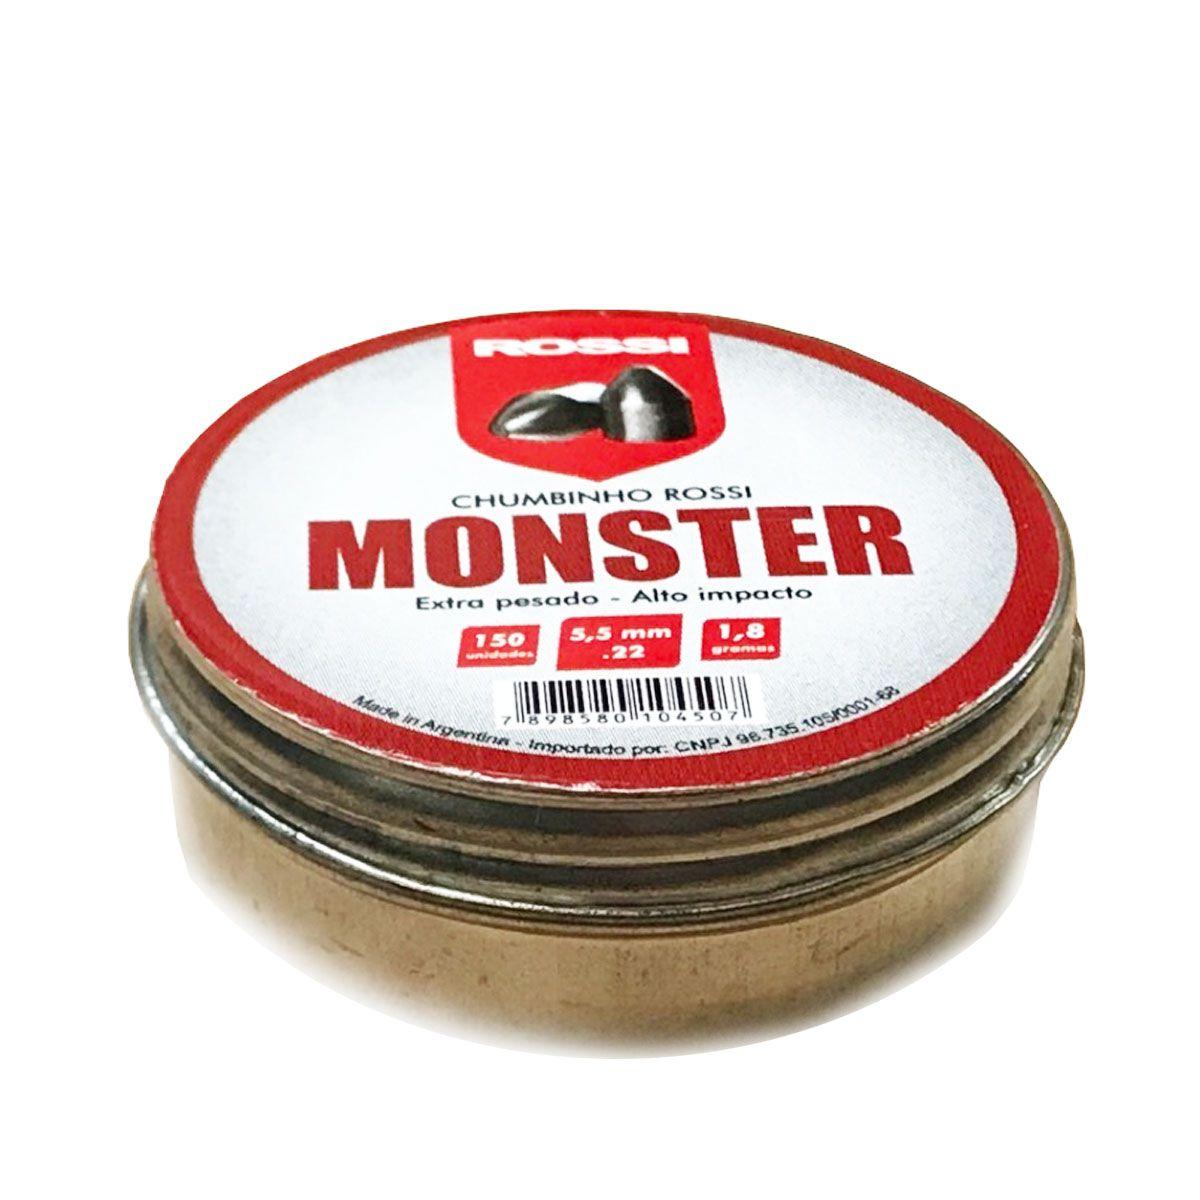 Chumbinho Rossi Monster 5,5mm 150 unidades